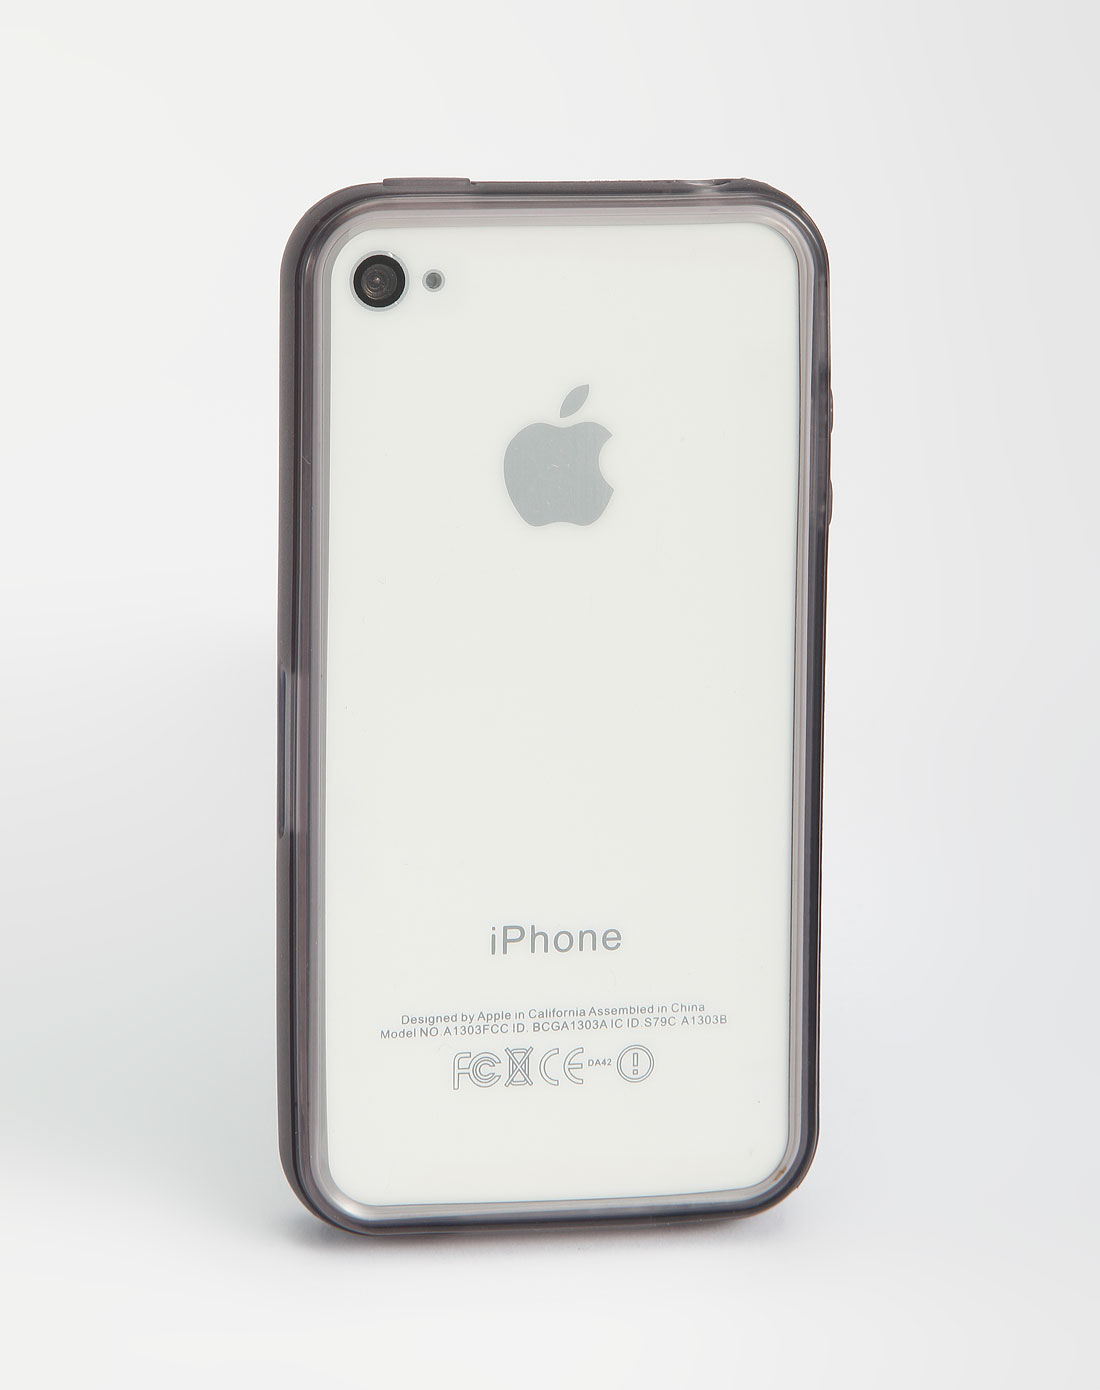 iphone4/4s 灰色tpu手机边框